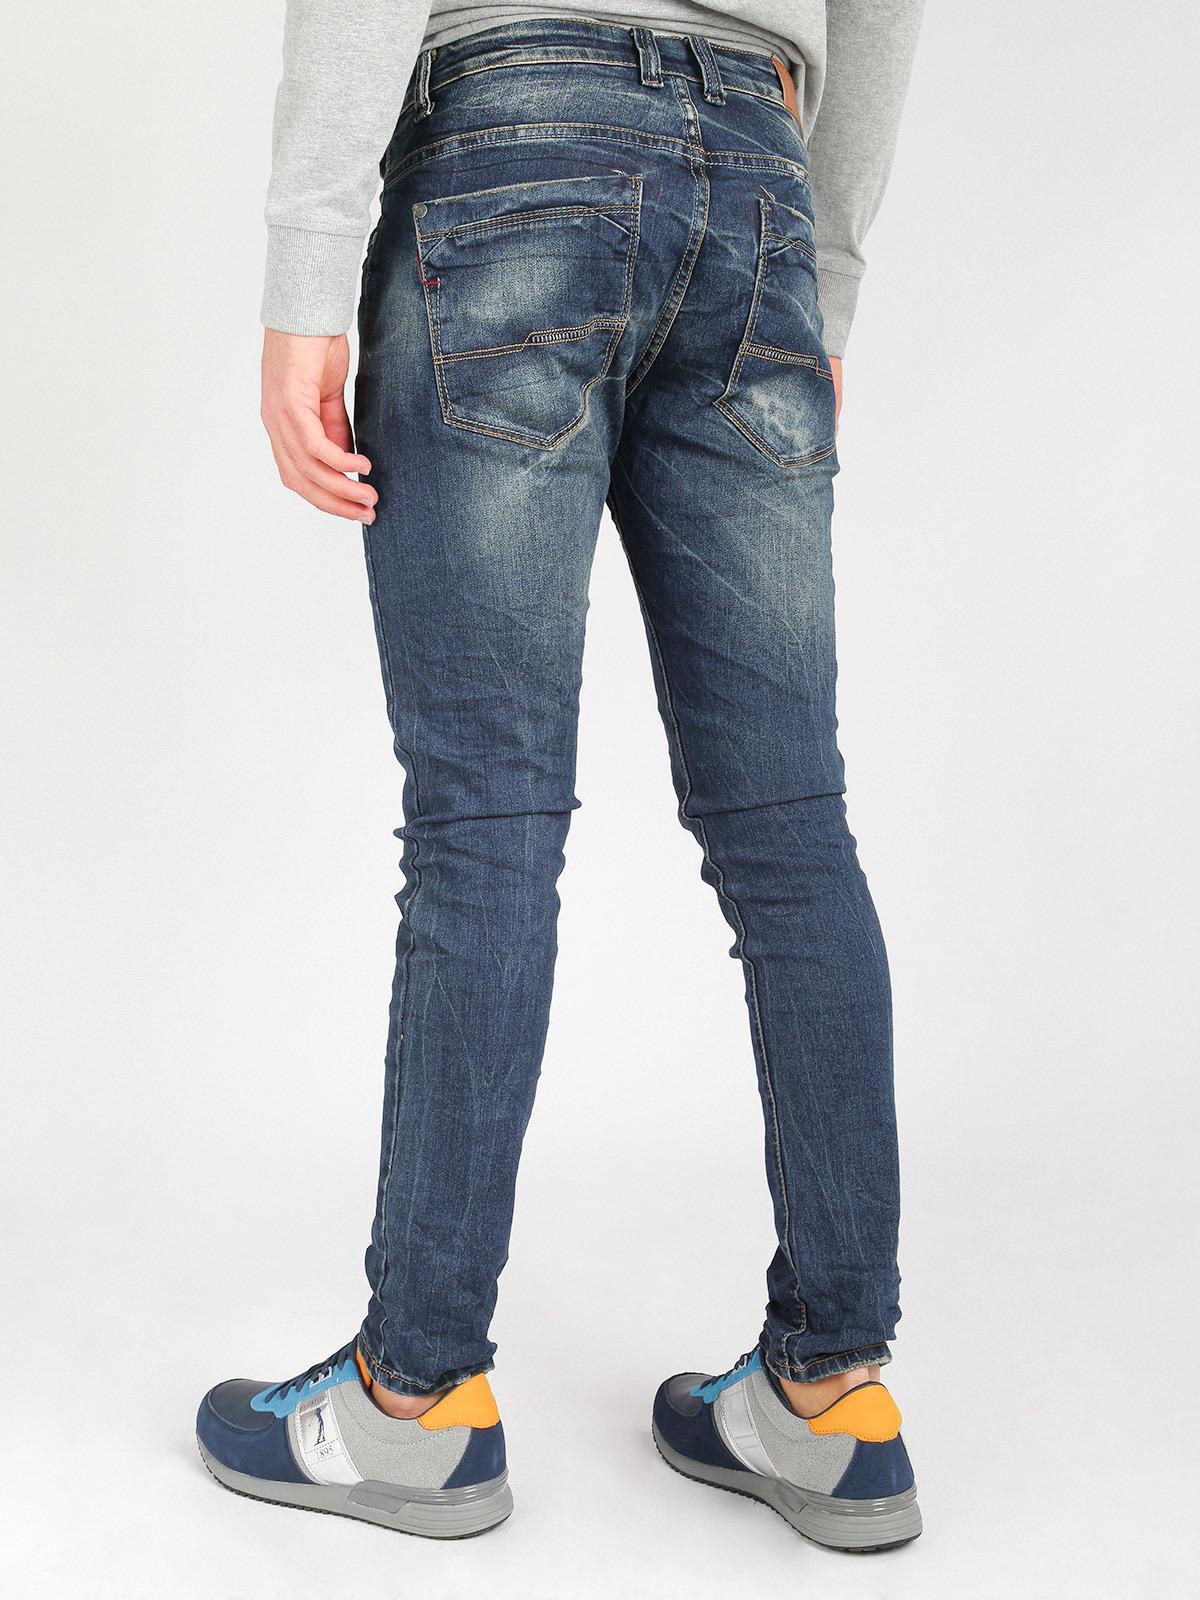 Dettagli su Sweet Years jeans uomo tg. 29